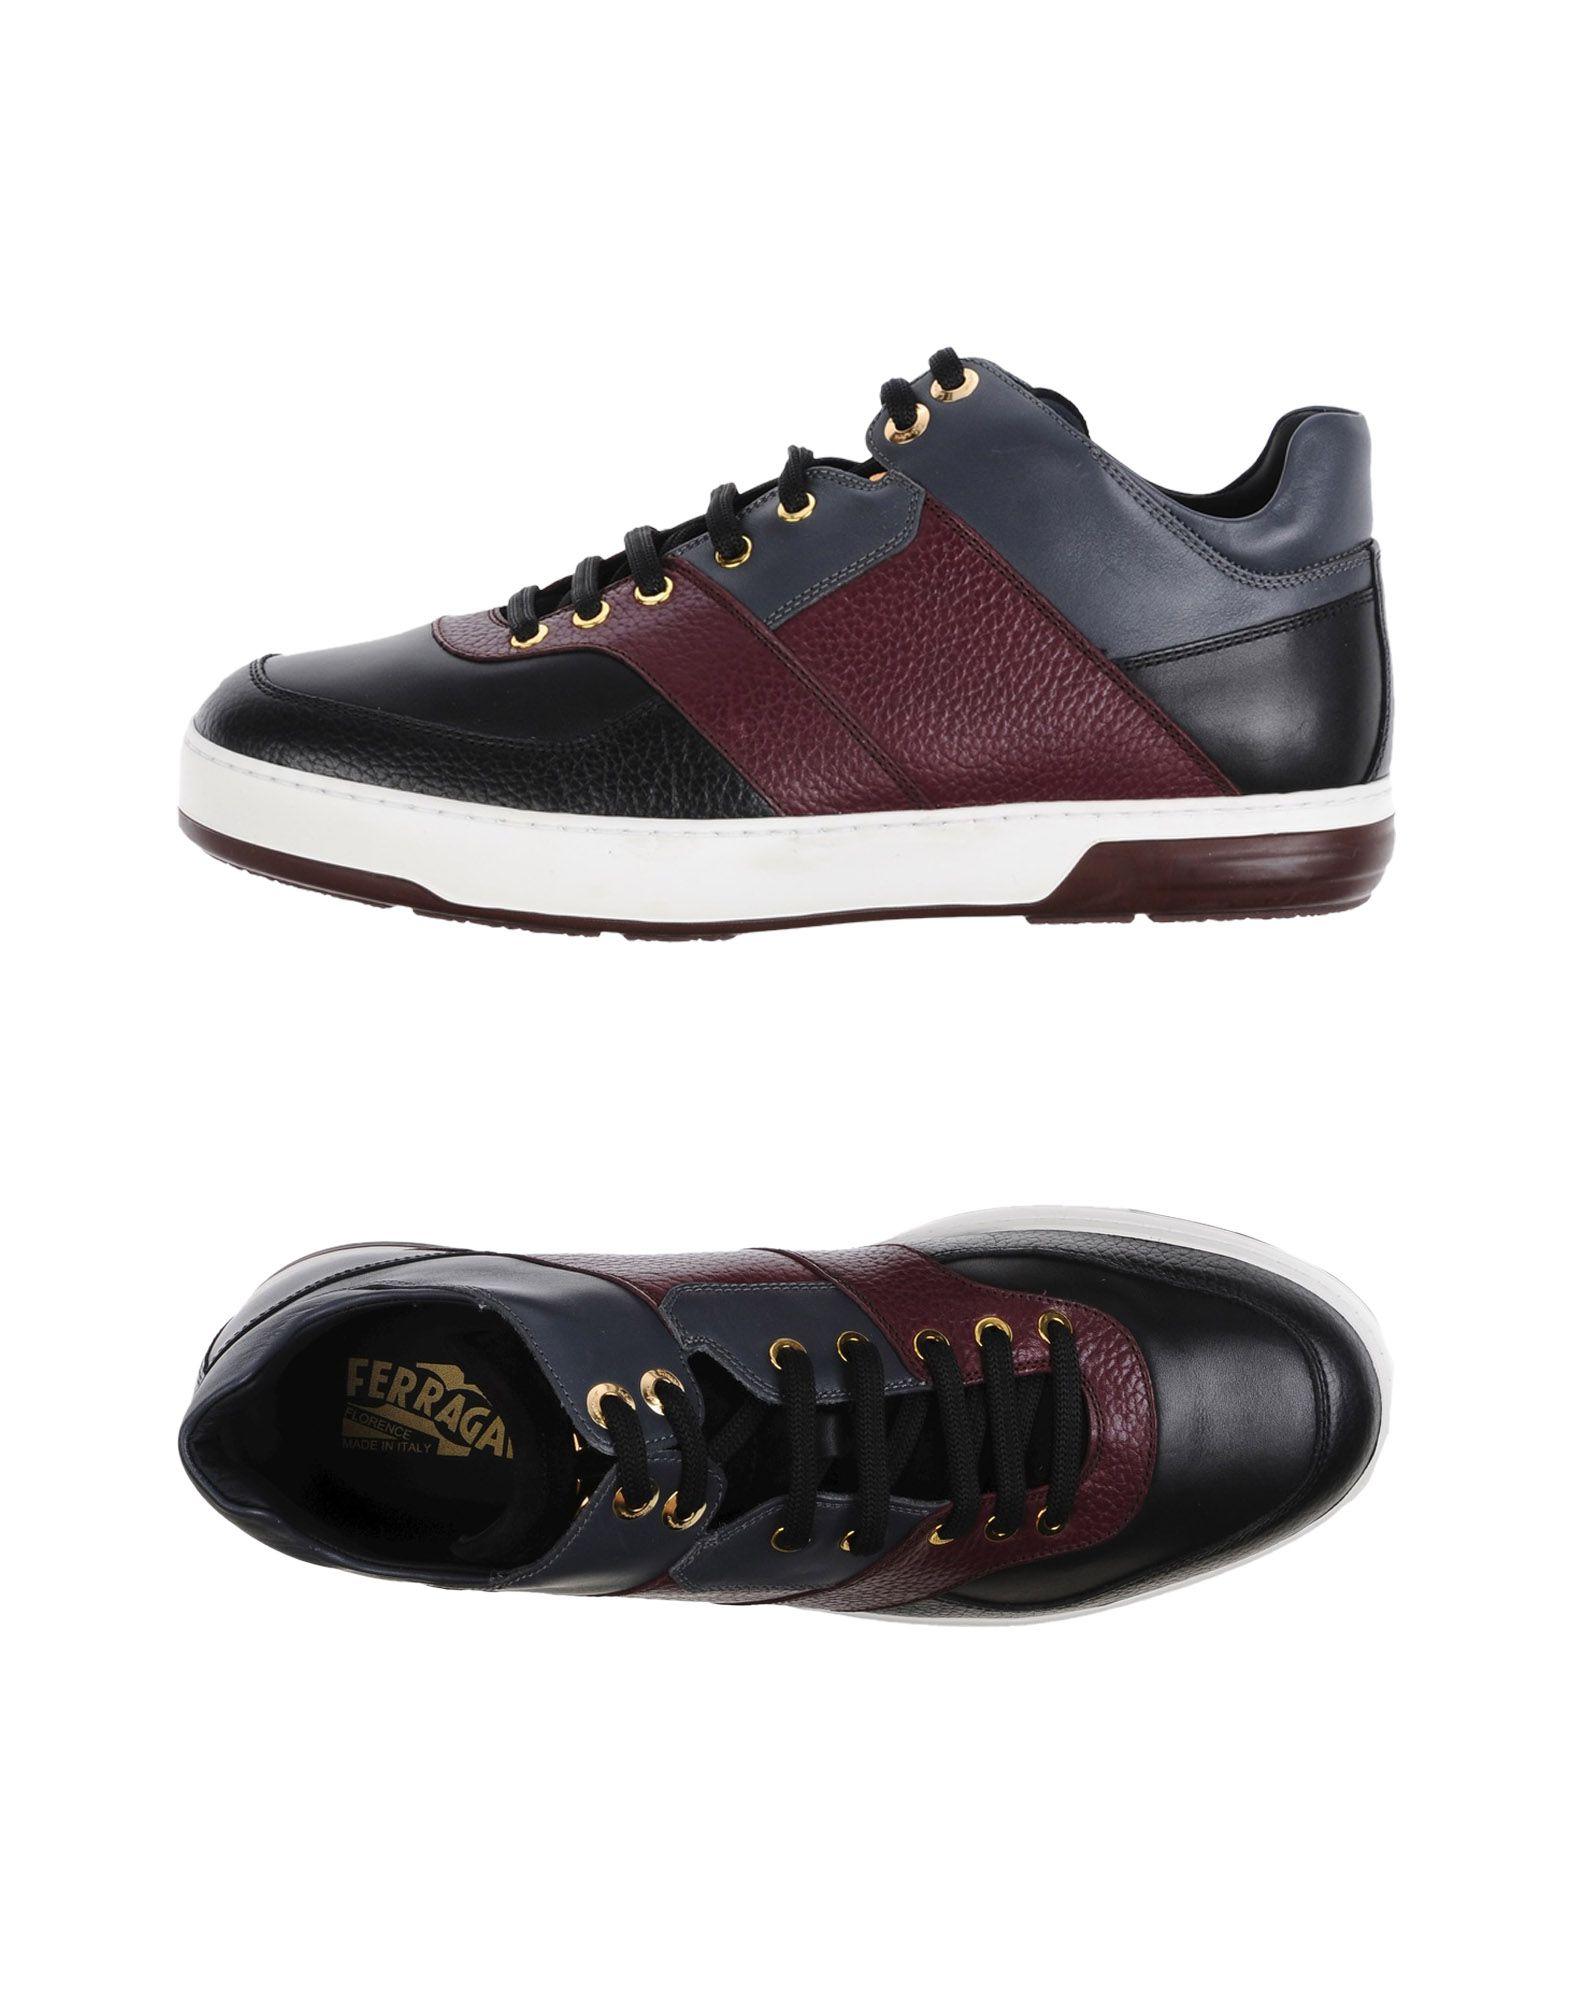 Salvatore 11284524OA Ferragamo Sneakers Herren  11284524OA Salvatore Gute Qualität beliebte Schuhe f987f0